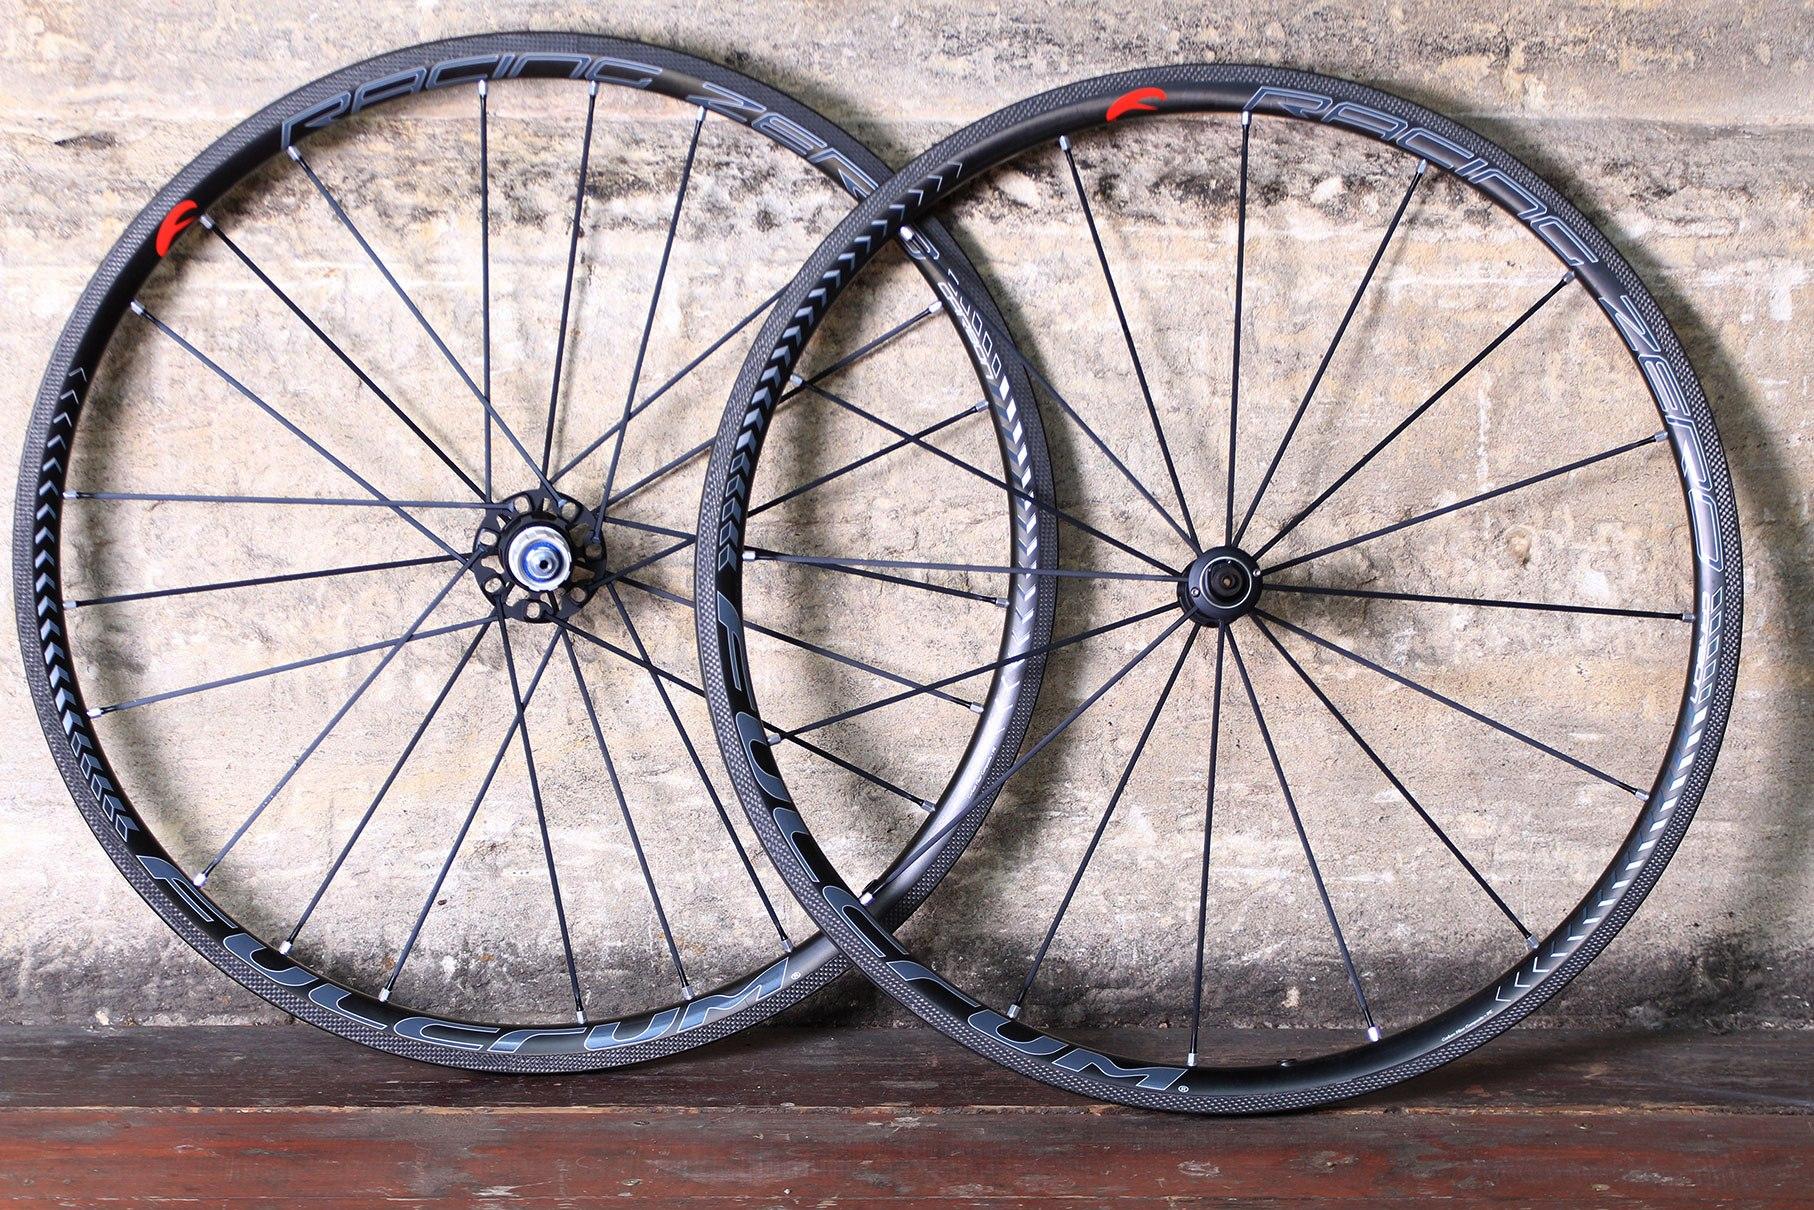 FULCRUM Carbon Bike//Cycling//Cycle//Push Bike Wheel Rim Decals Stickers Kit 2 RIMS